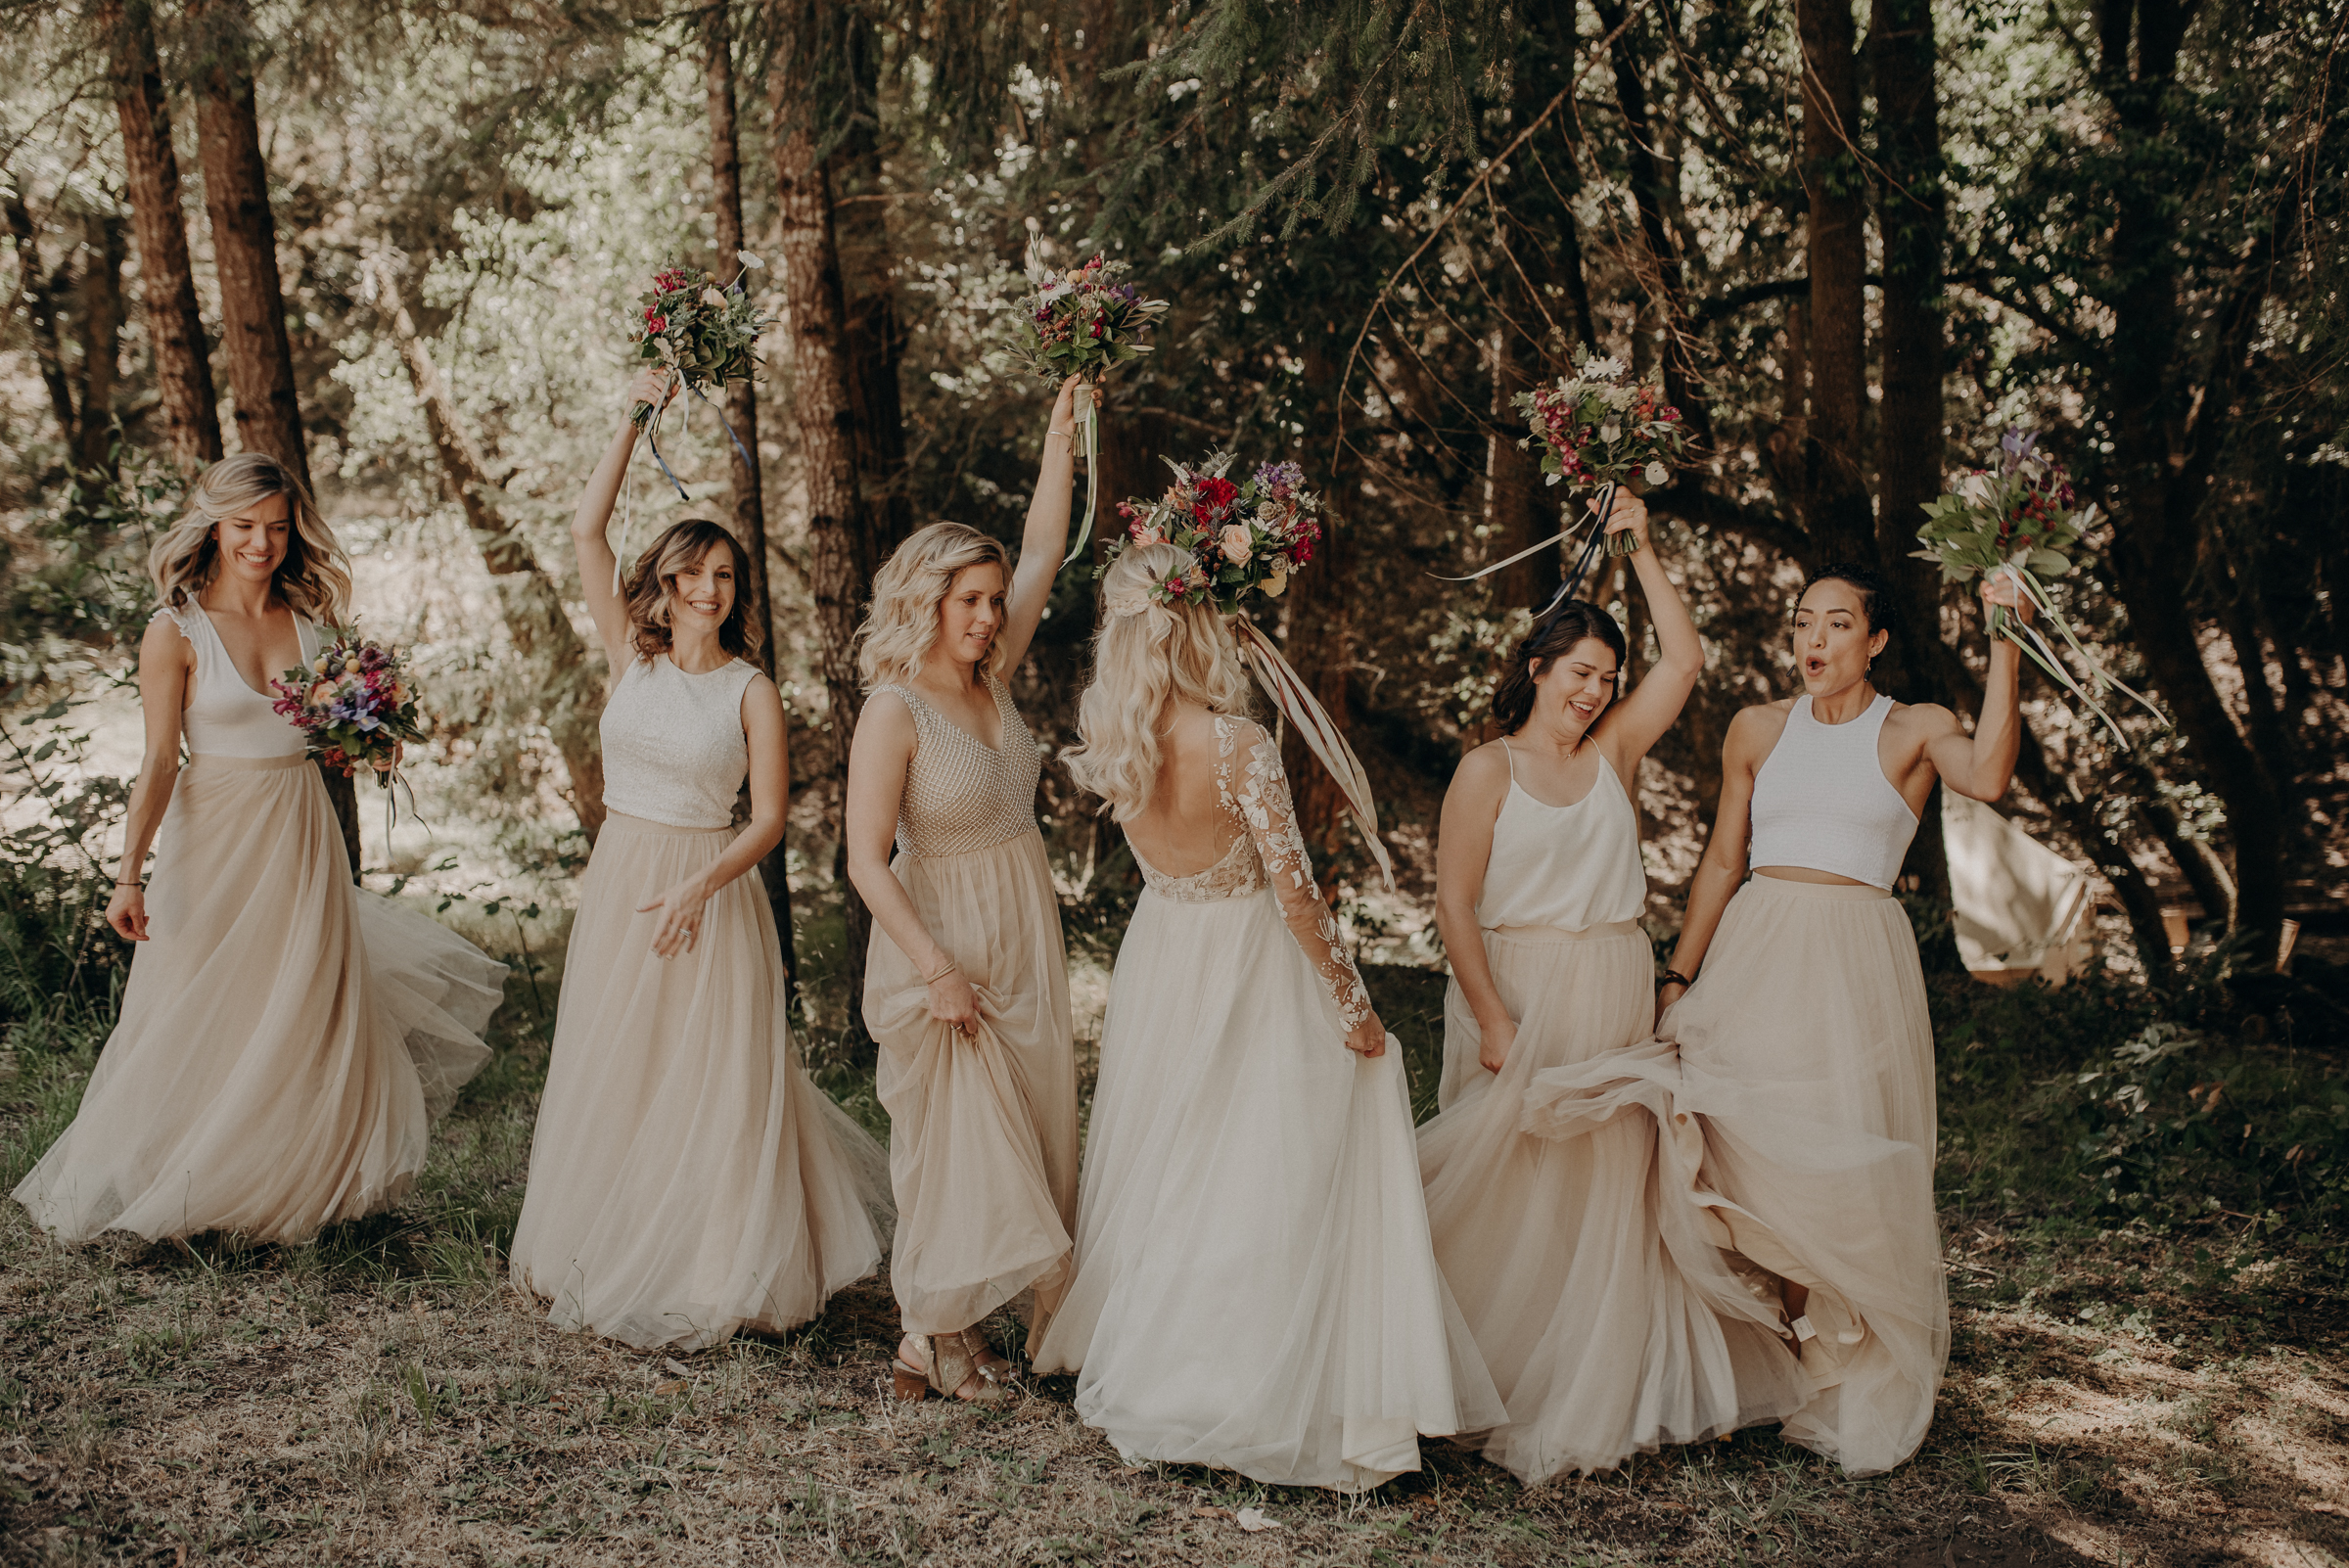 IsaiahAndTaylor.com - California Destination Elopement, Lake Leonard Reserve Wedding, Ukiah-042.jpg